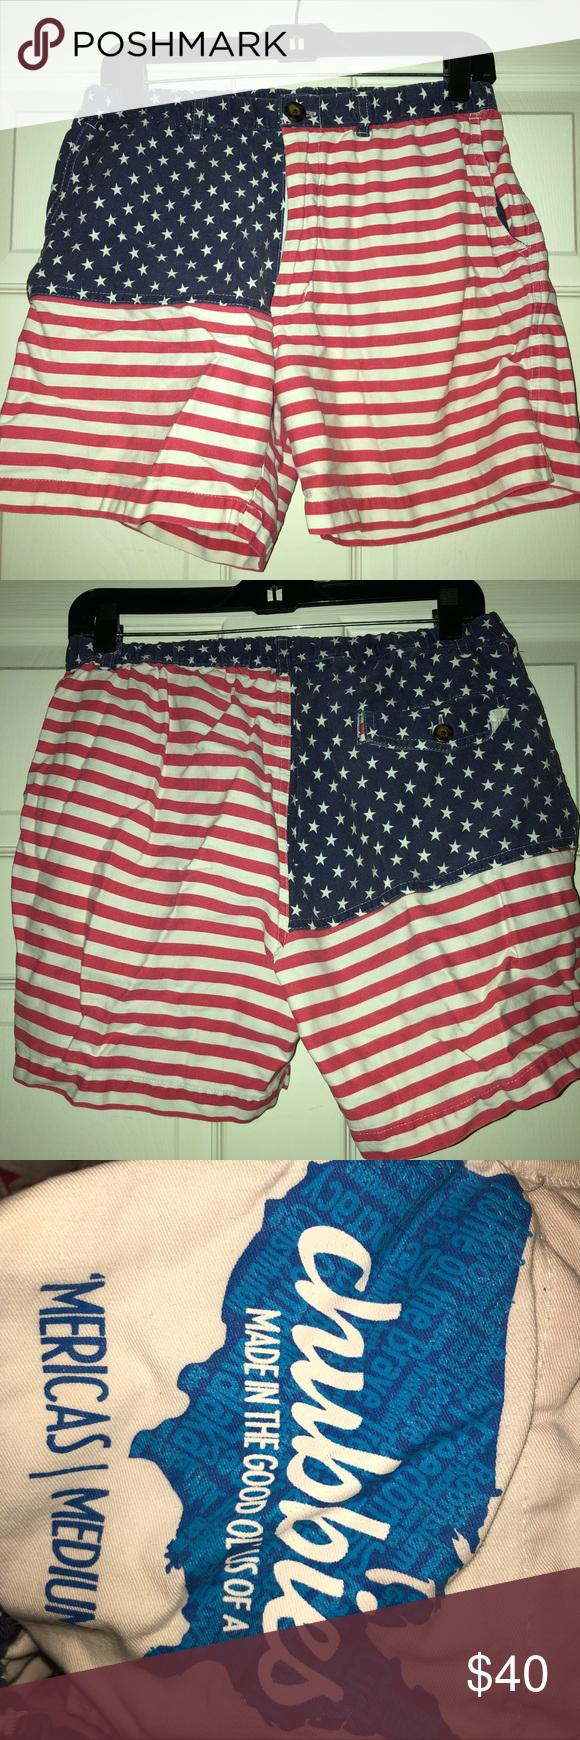 American Flag Chubbies American Flag Print American Flag Clothes Design